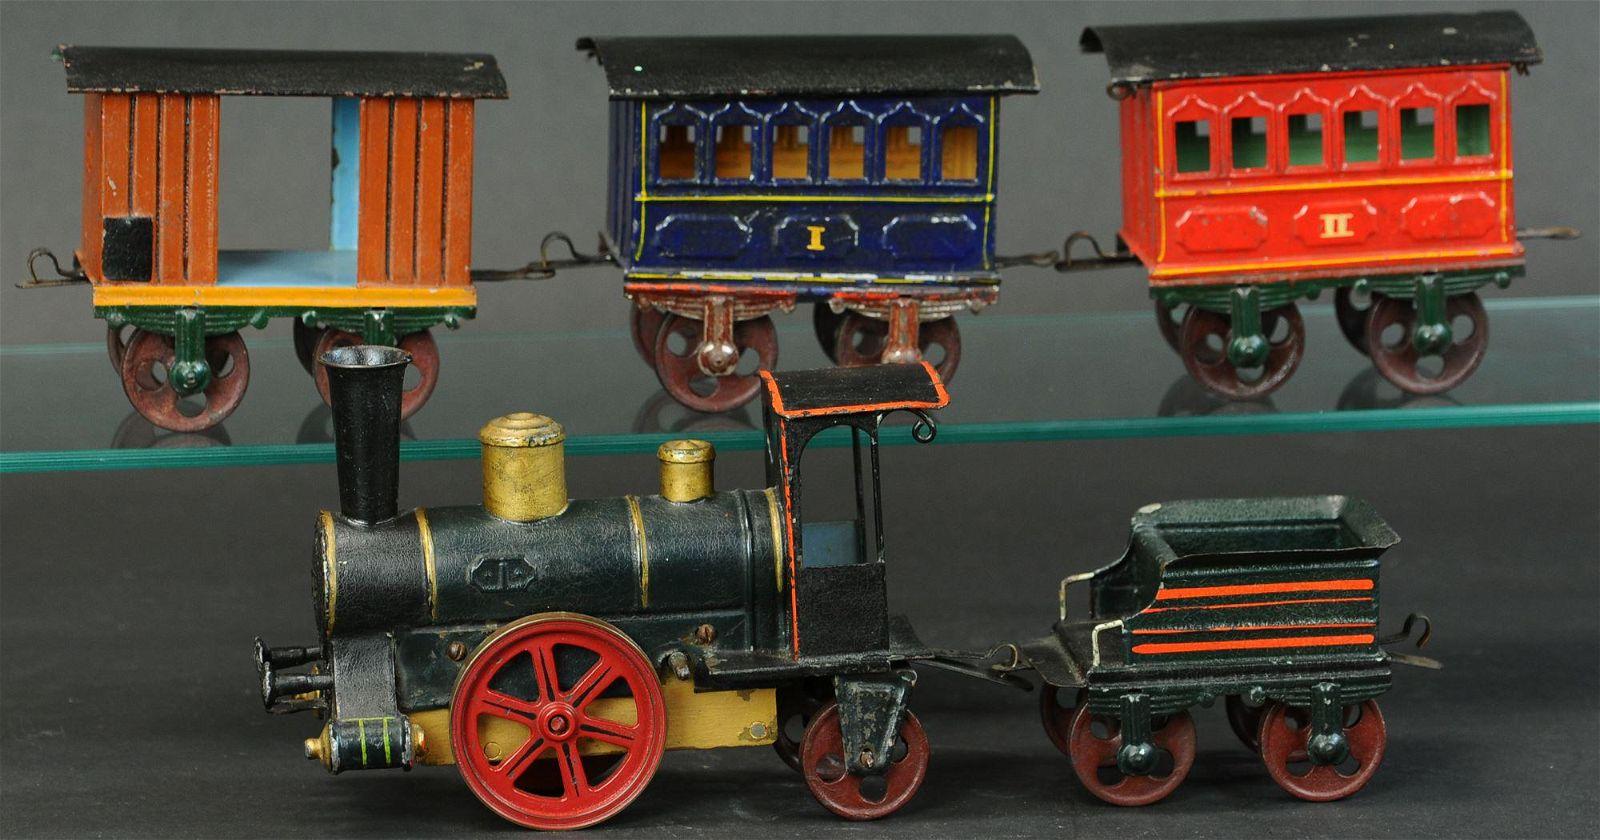 EARLY MARKLIN FLOOR TRAIN SET